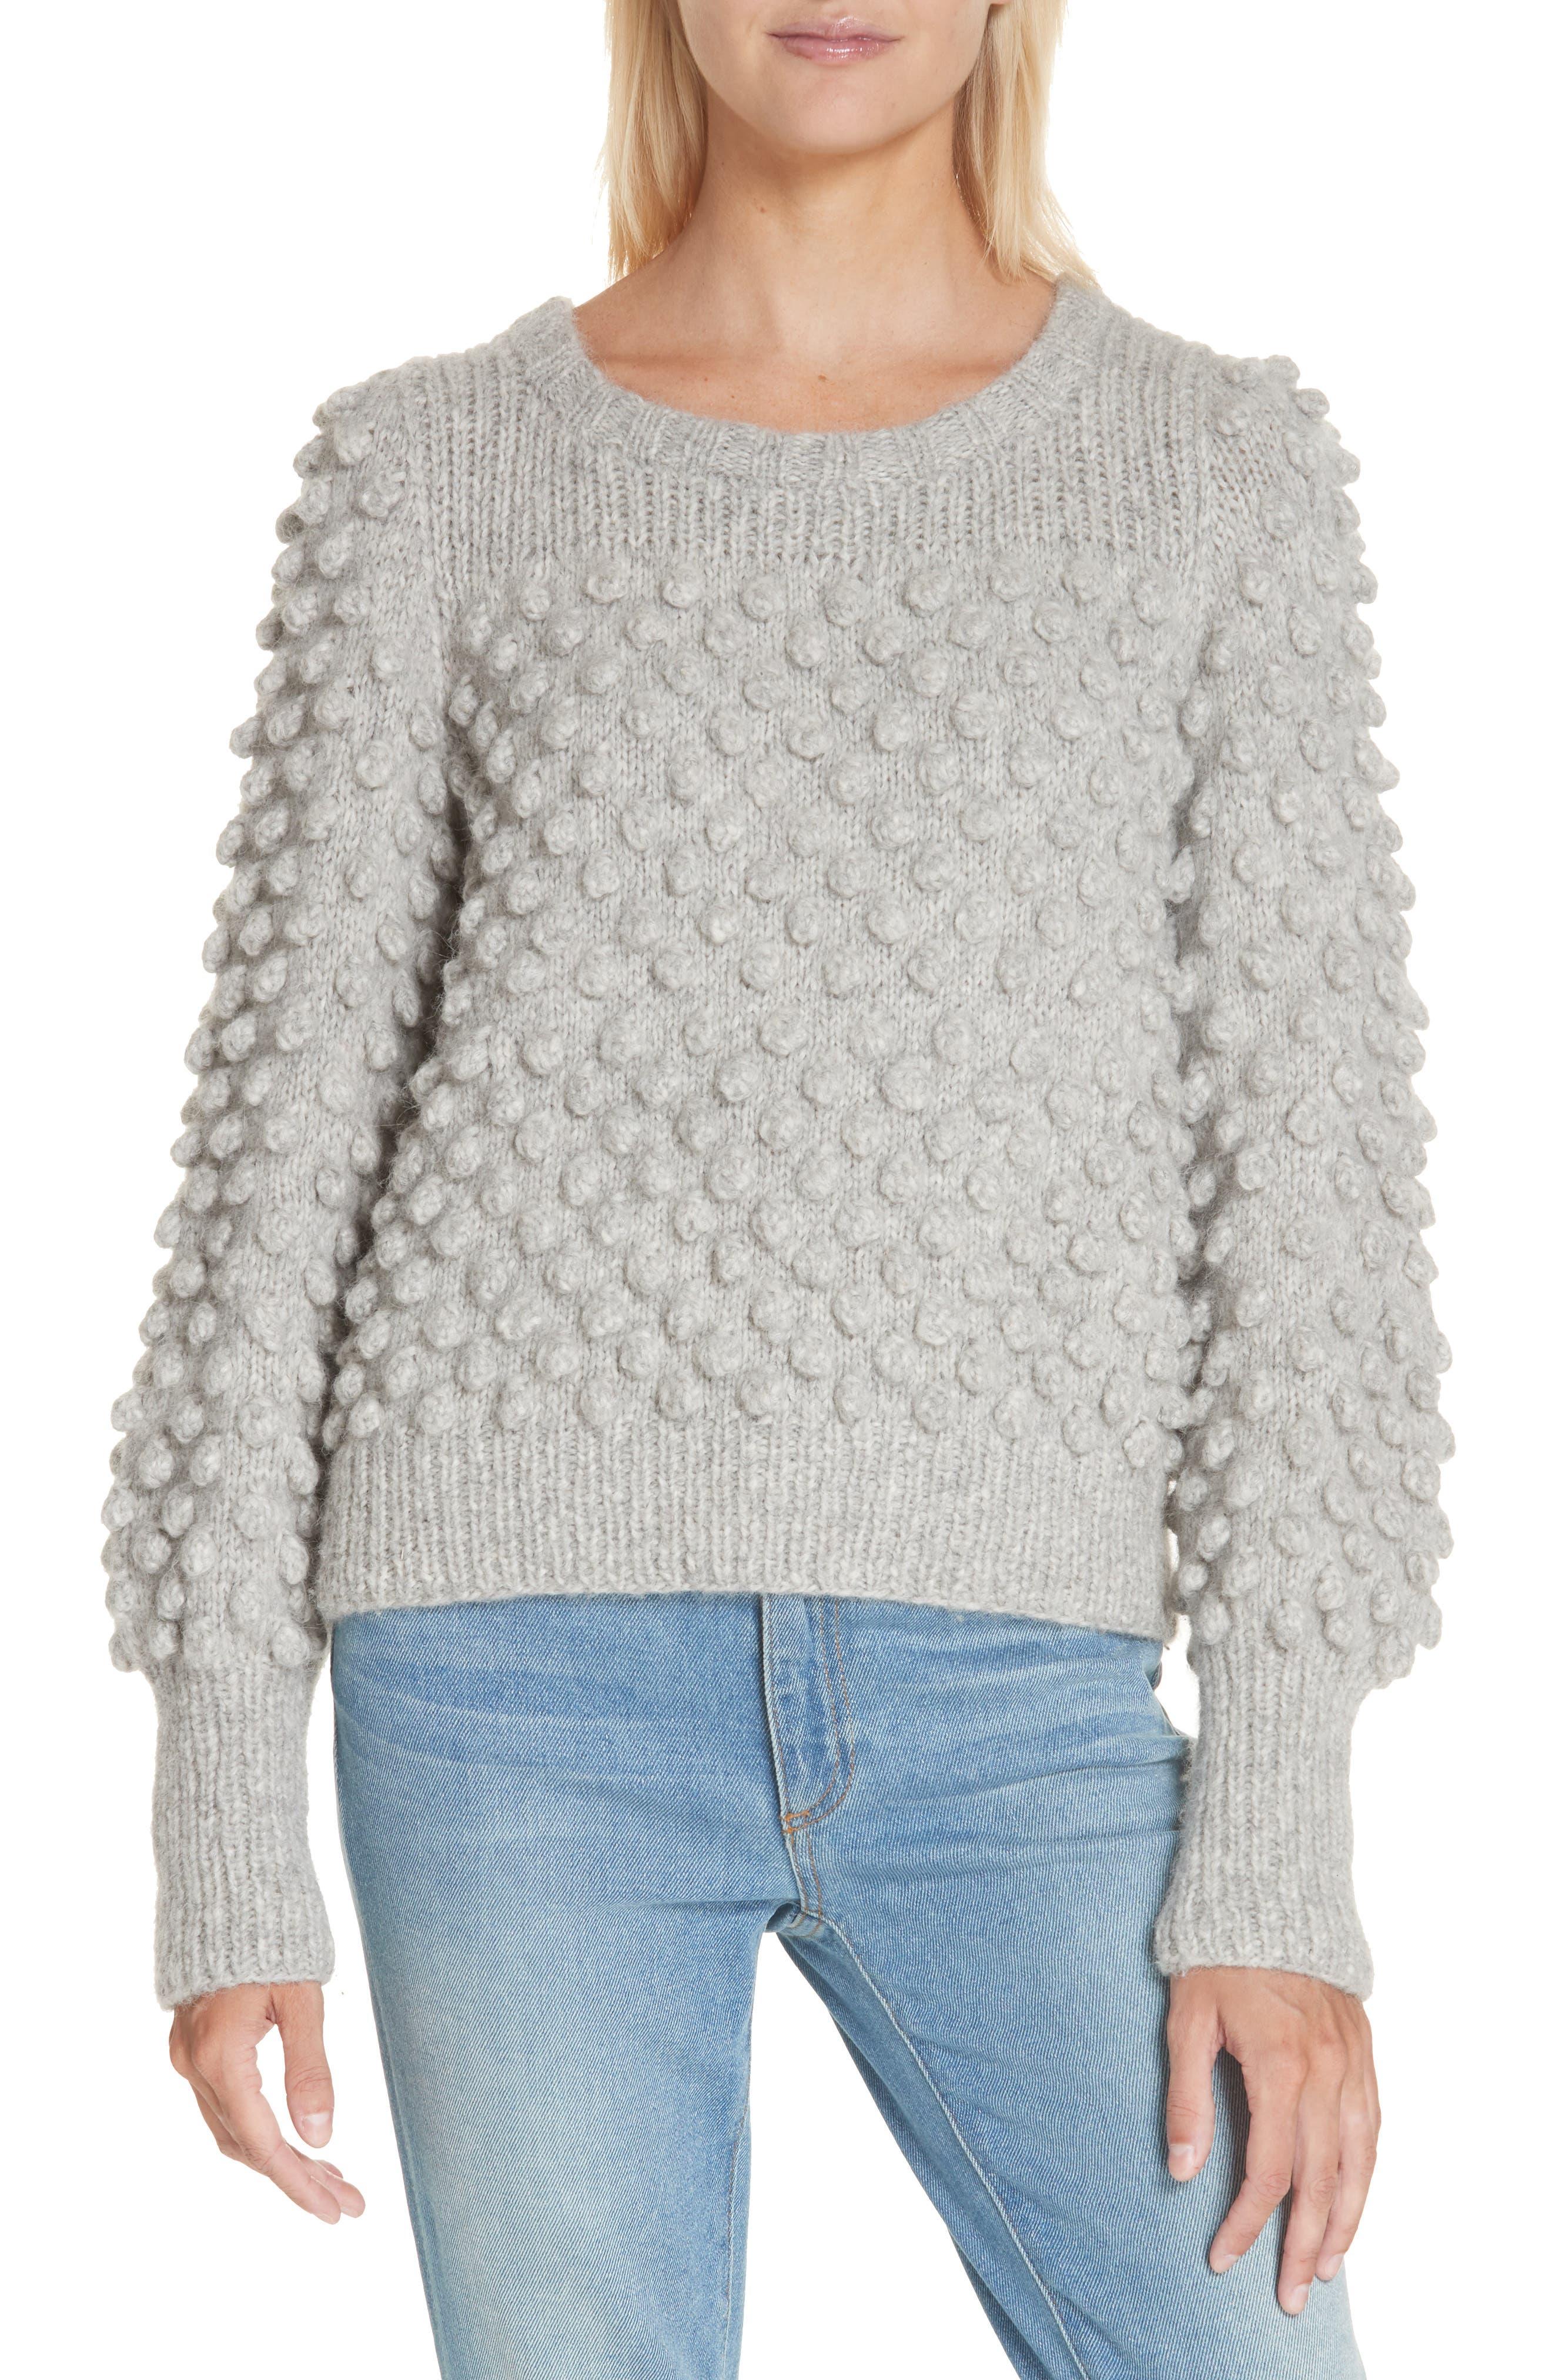 Camilla Baby Alpaca Blend Sweater,                             Main thumbnail 1, color,                             PALE MELANGE GREY